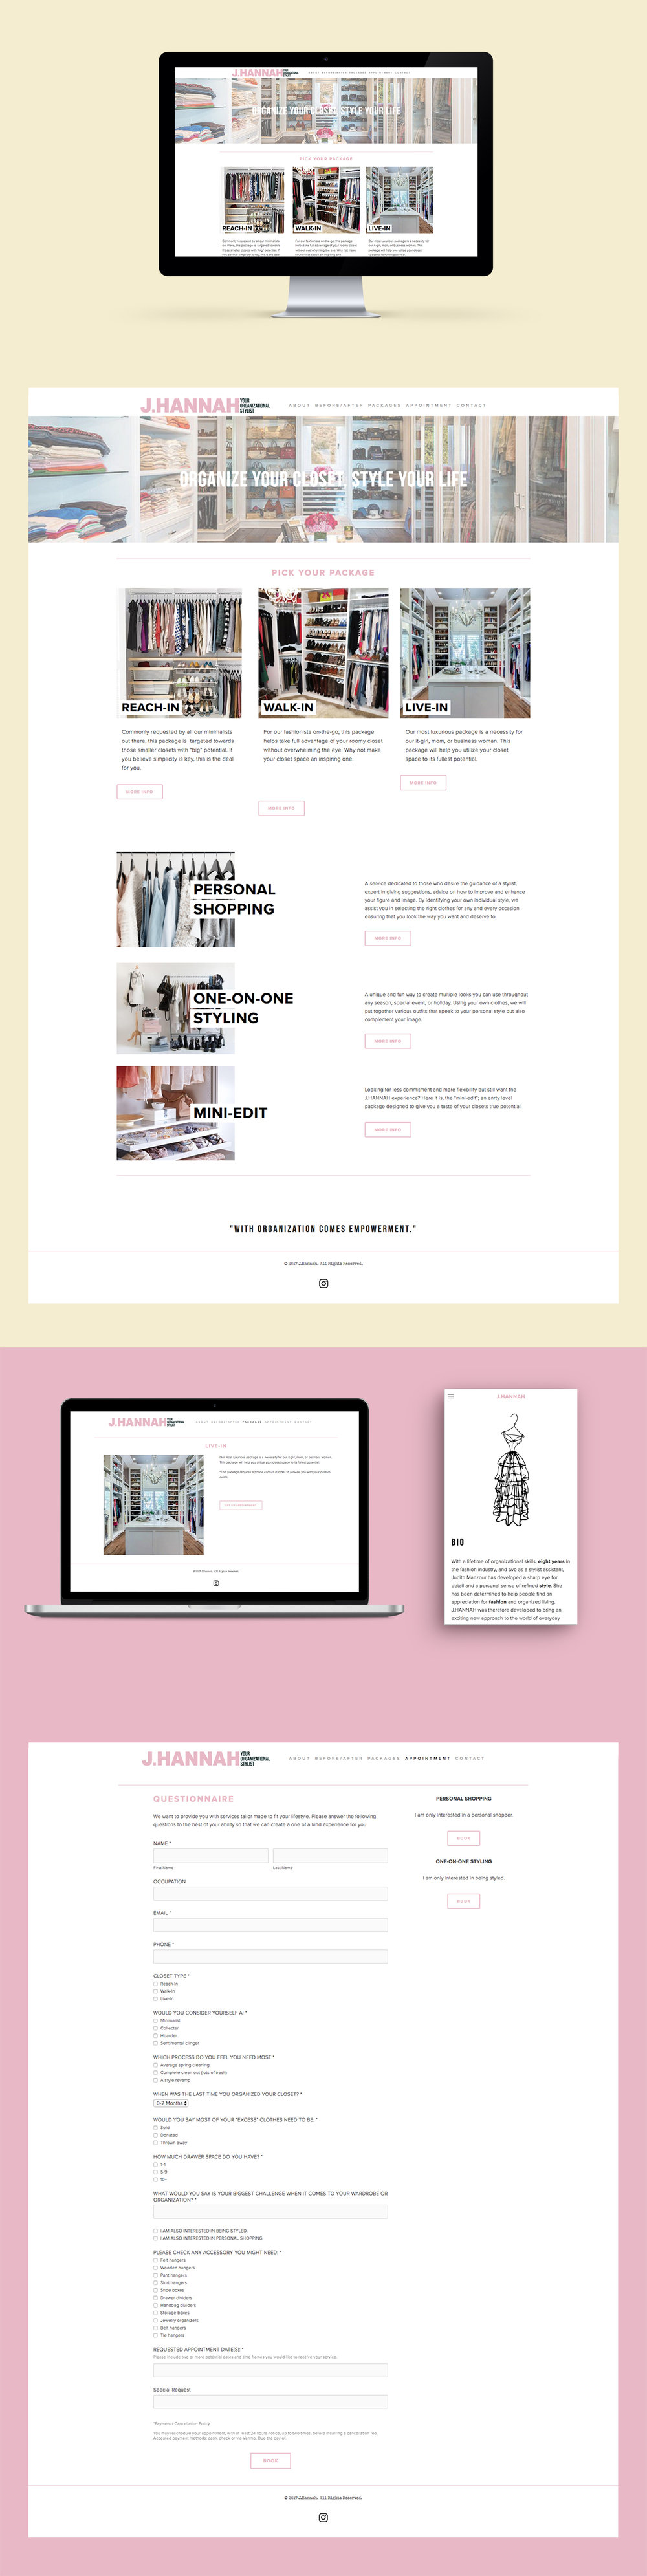 JHannah-Webdesign.jpg